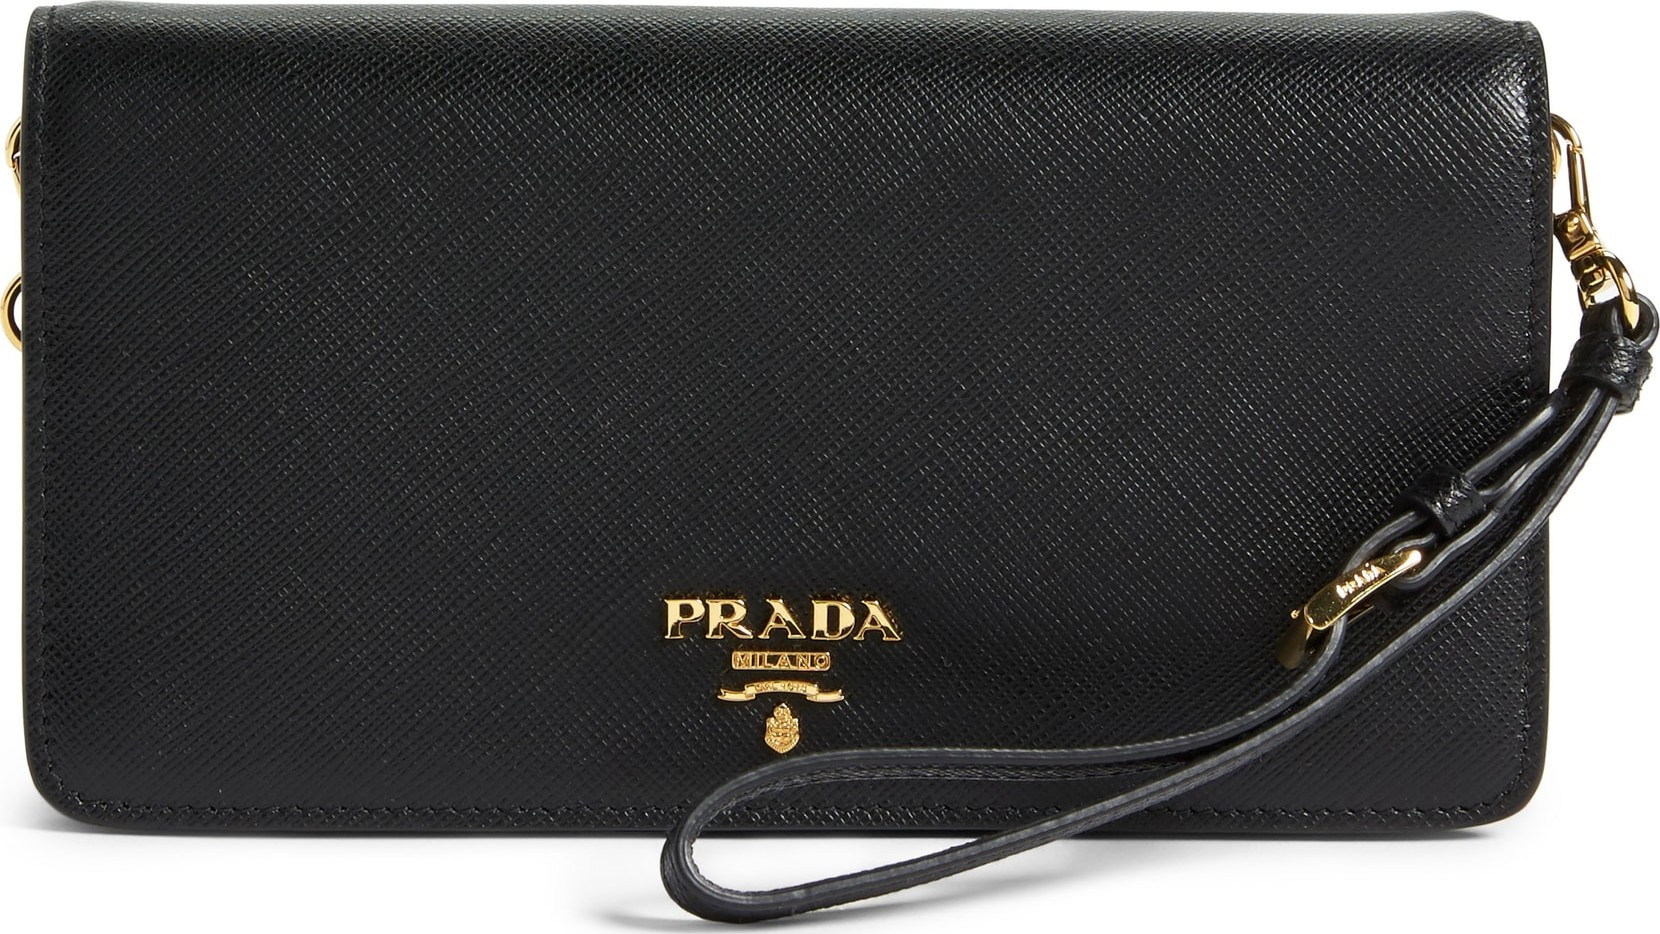 671dbd4382ddb9 ... uk prada saffiano metal oro flap wallet on a chain 0a56c 4b008 ...